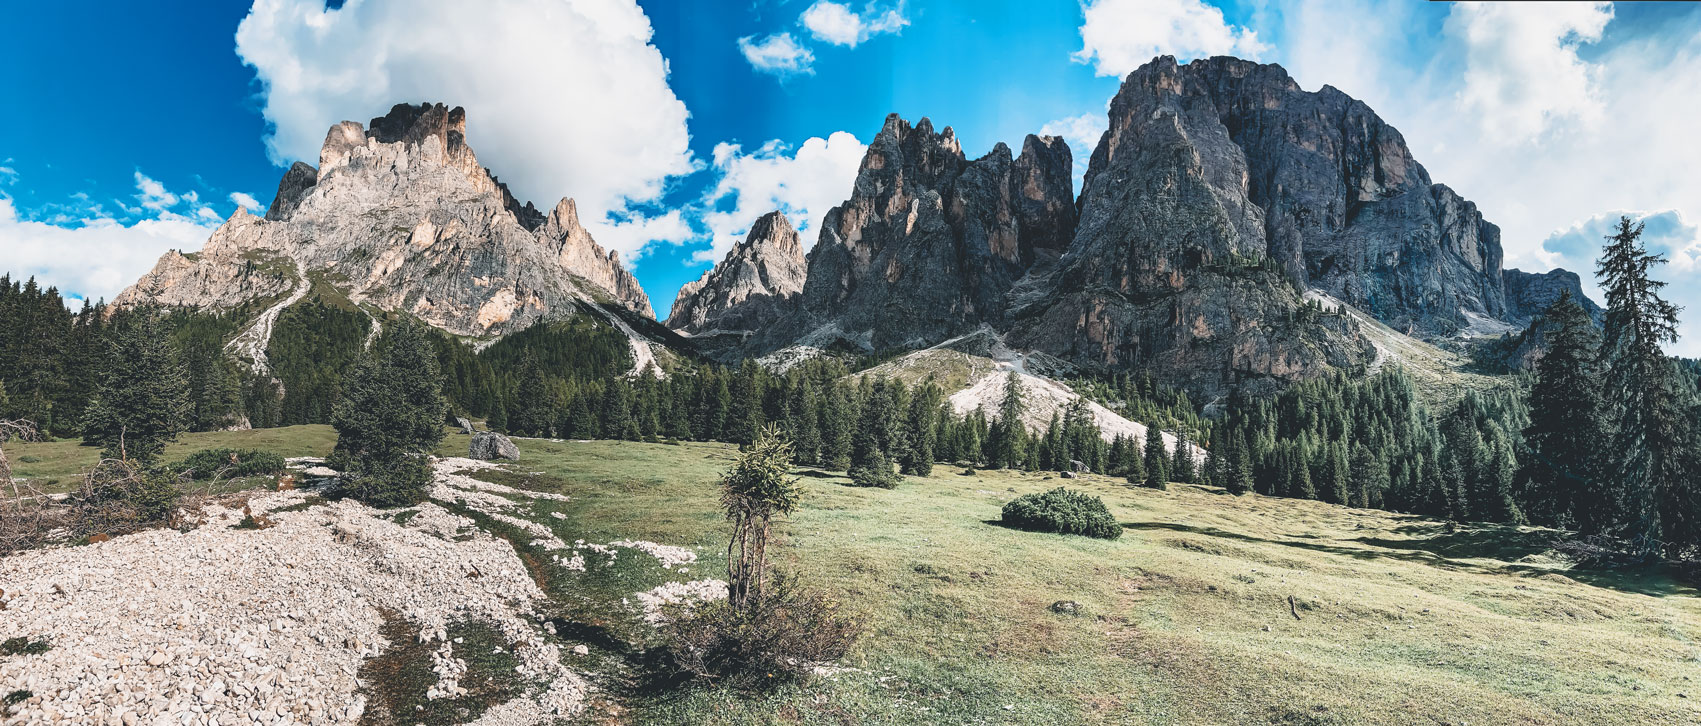 Langkofelgruppe in Südtirol, Berge, Wiese, Bäume und Himmel